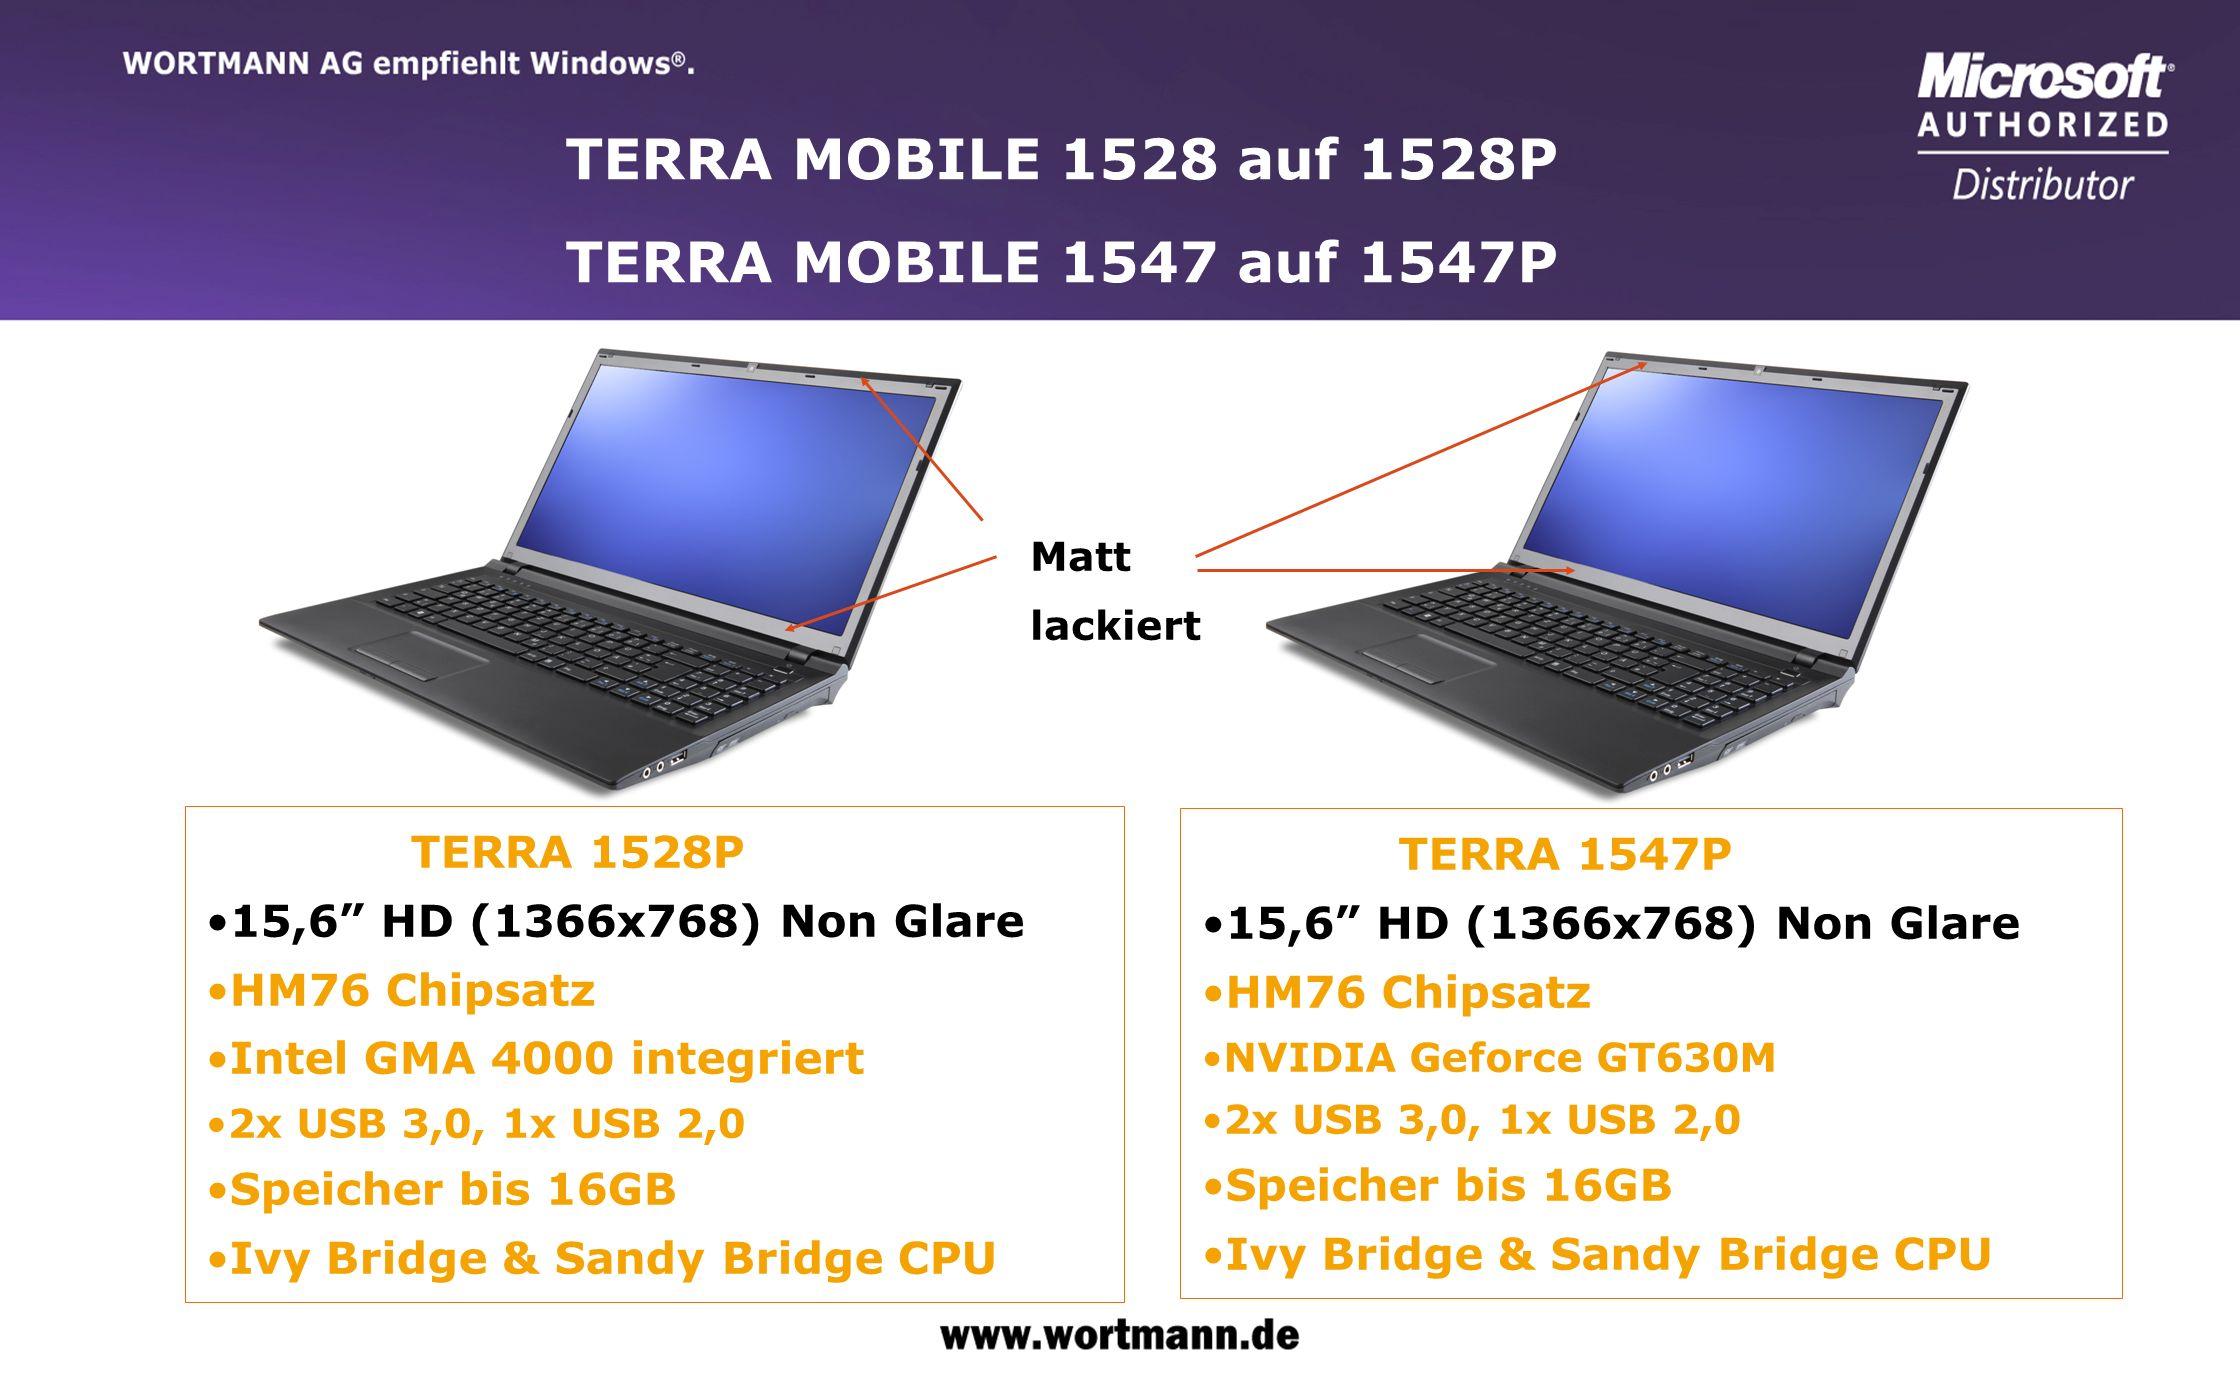 www.wortmann.de TERRA MOBILE 1766Q/1773Q – High-End 17 Notebook TERRA 1766Q 17,3 HD+ (1600x900) Non Glare Intel GMA 4000 integriert HM76 Chipsatz Speicher bis 16GB Ivy Bridge & Sandy Bridge CPU TERRA 1773Q 17,3 FHD (1920x1080) Non Glare 2GB NVIDIA GT640 Intel HM76 Chipsatz Speicher bis 16GB Ivy Bridge & Sandy Bridge CPU Matt lackiert 2GB VGA!